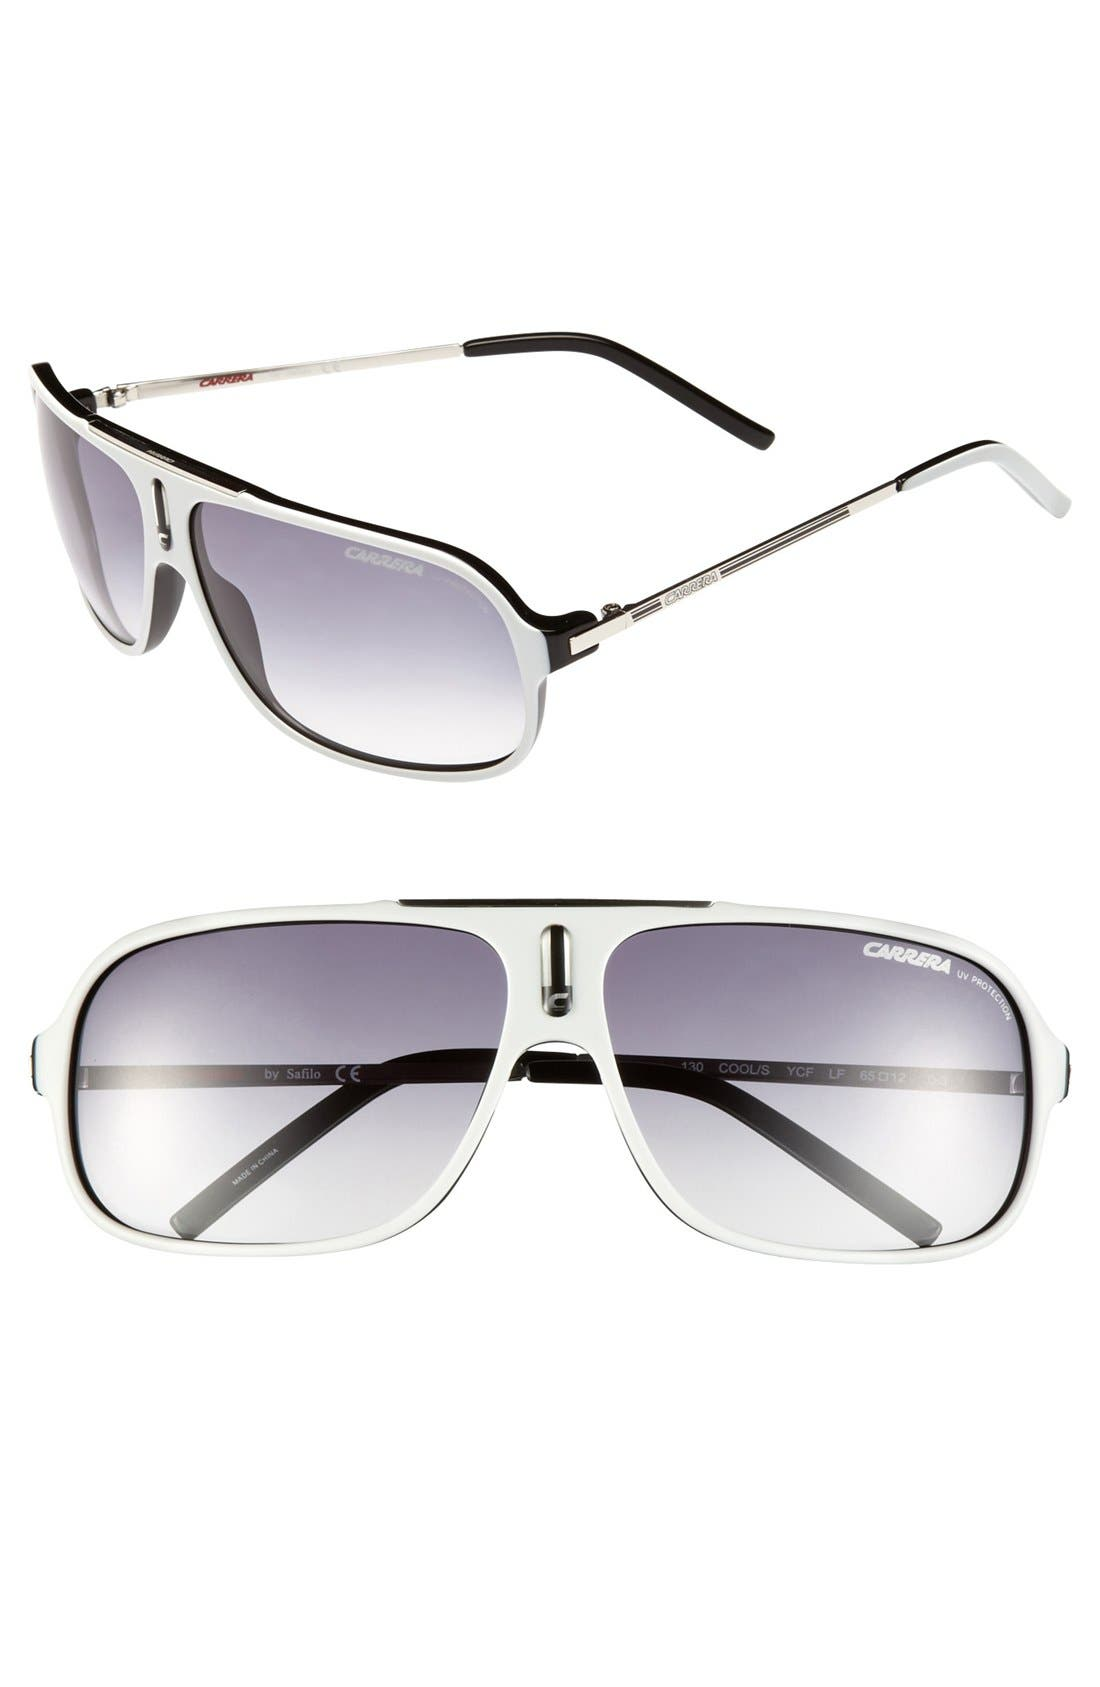 Main Image - Carrera Eyewear 'Cool' 61mm Vintage Inspired Aviator Sunglasses